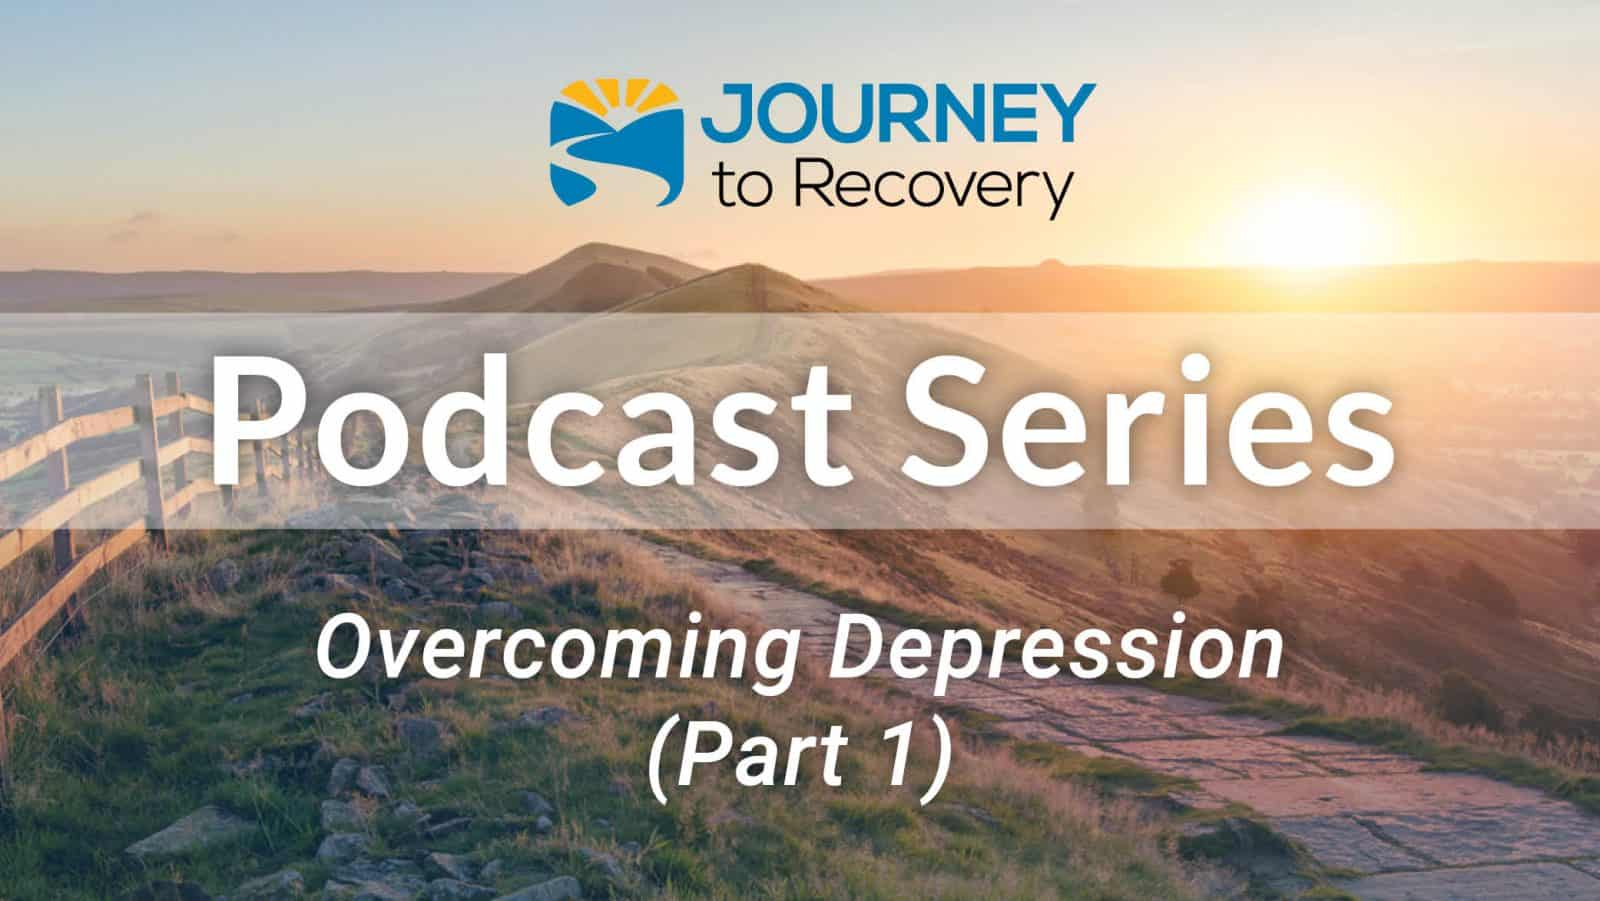 Overcoming Depression (Part 1)